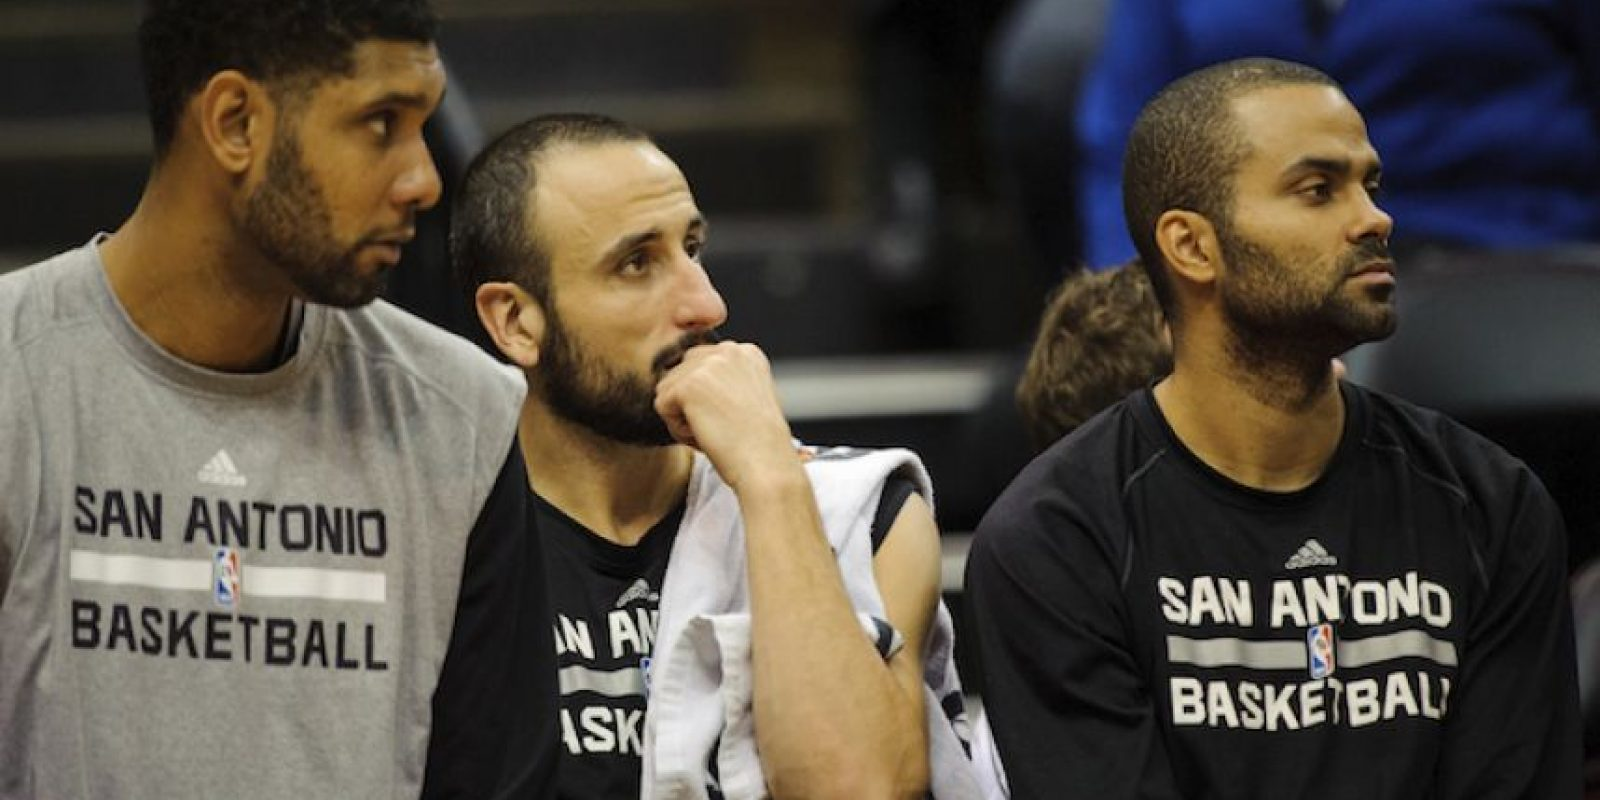 Junto a Tony Parker y Manu Ginóbili ha formado un trío temible. Foto:Getty Images